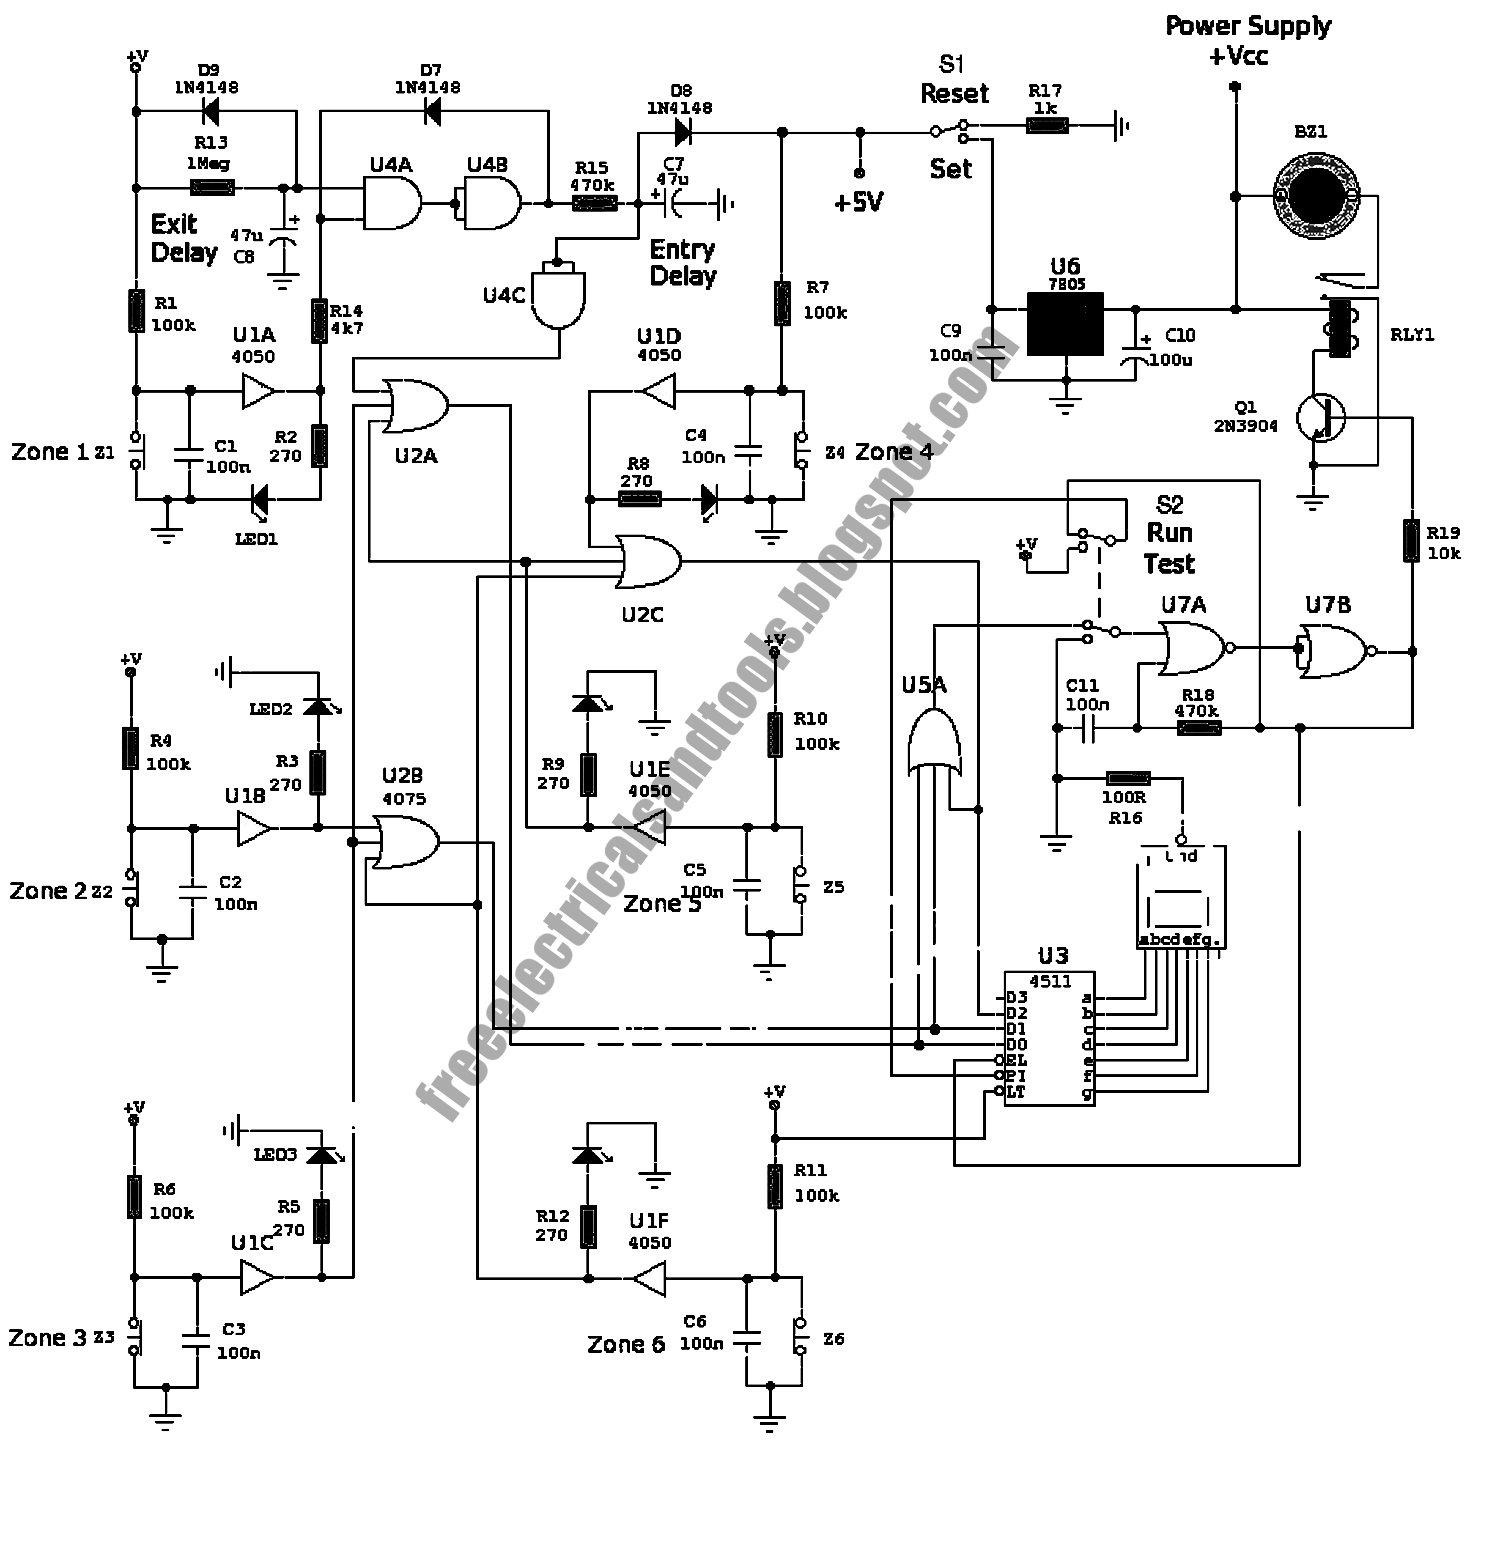 free schematic diagram  06  01  2010  01  2010